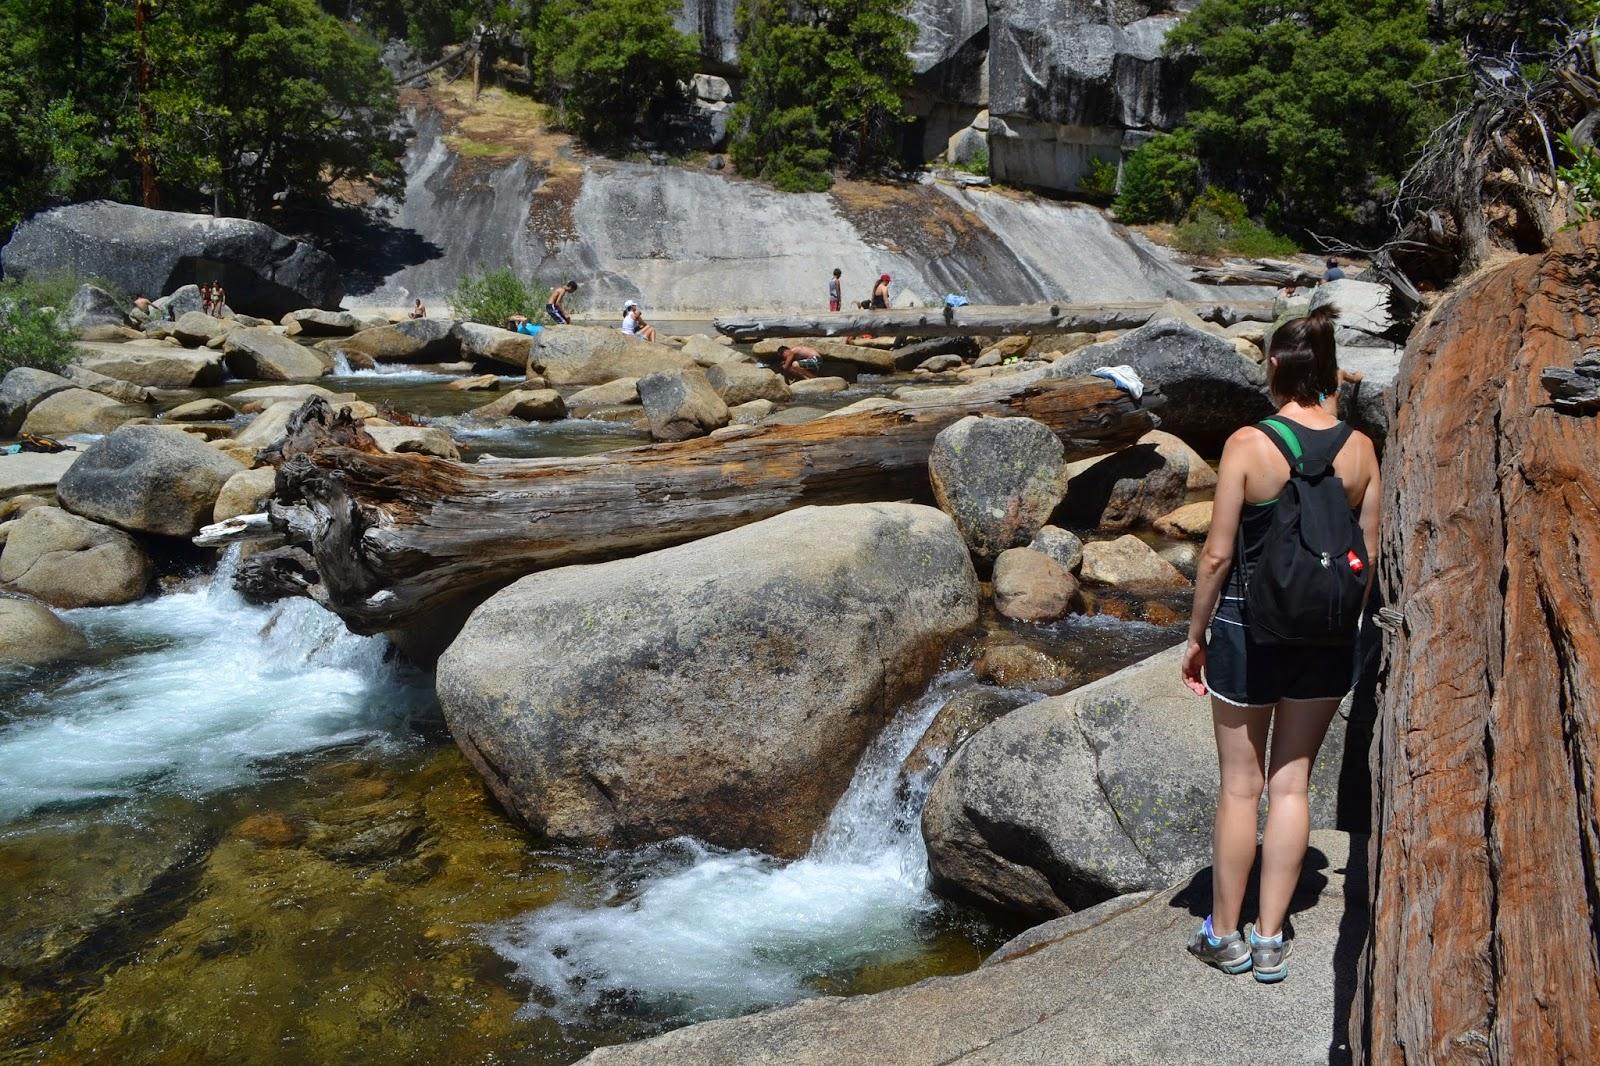 Top of waterfall hike in Yosemite